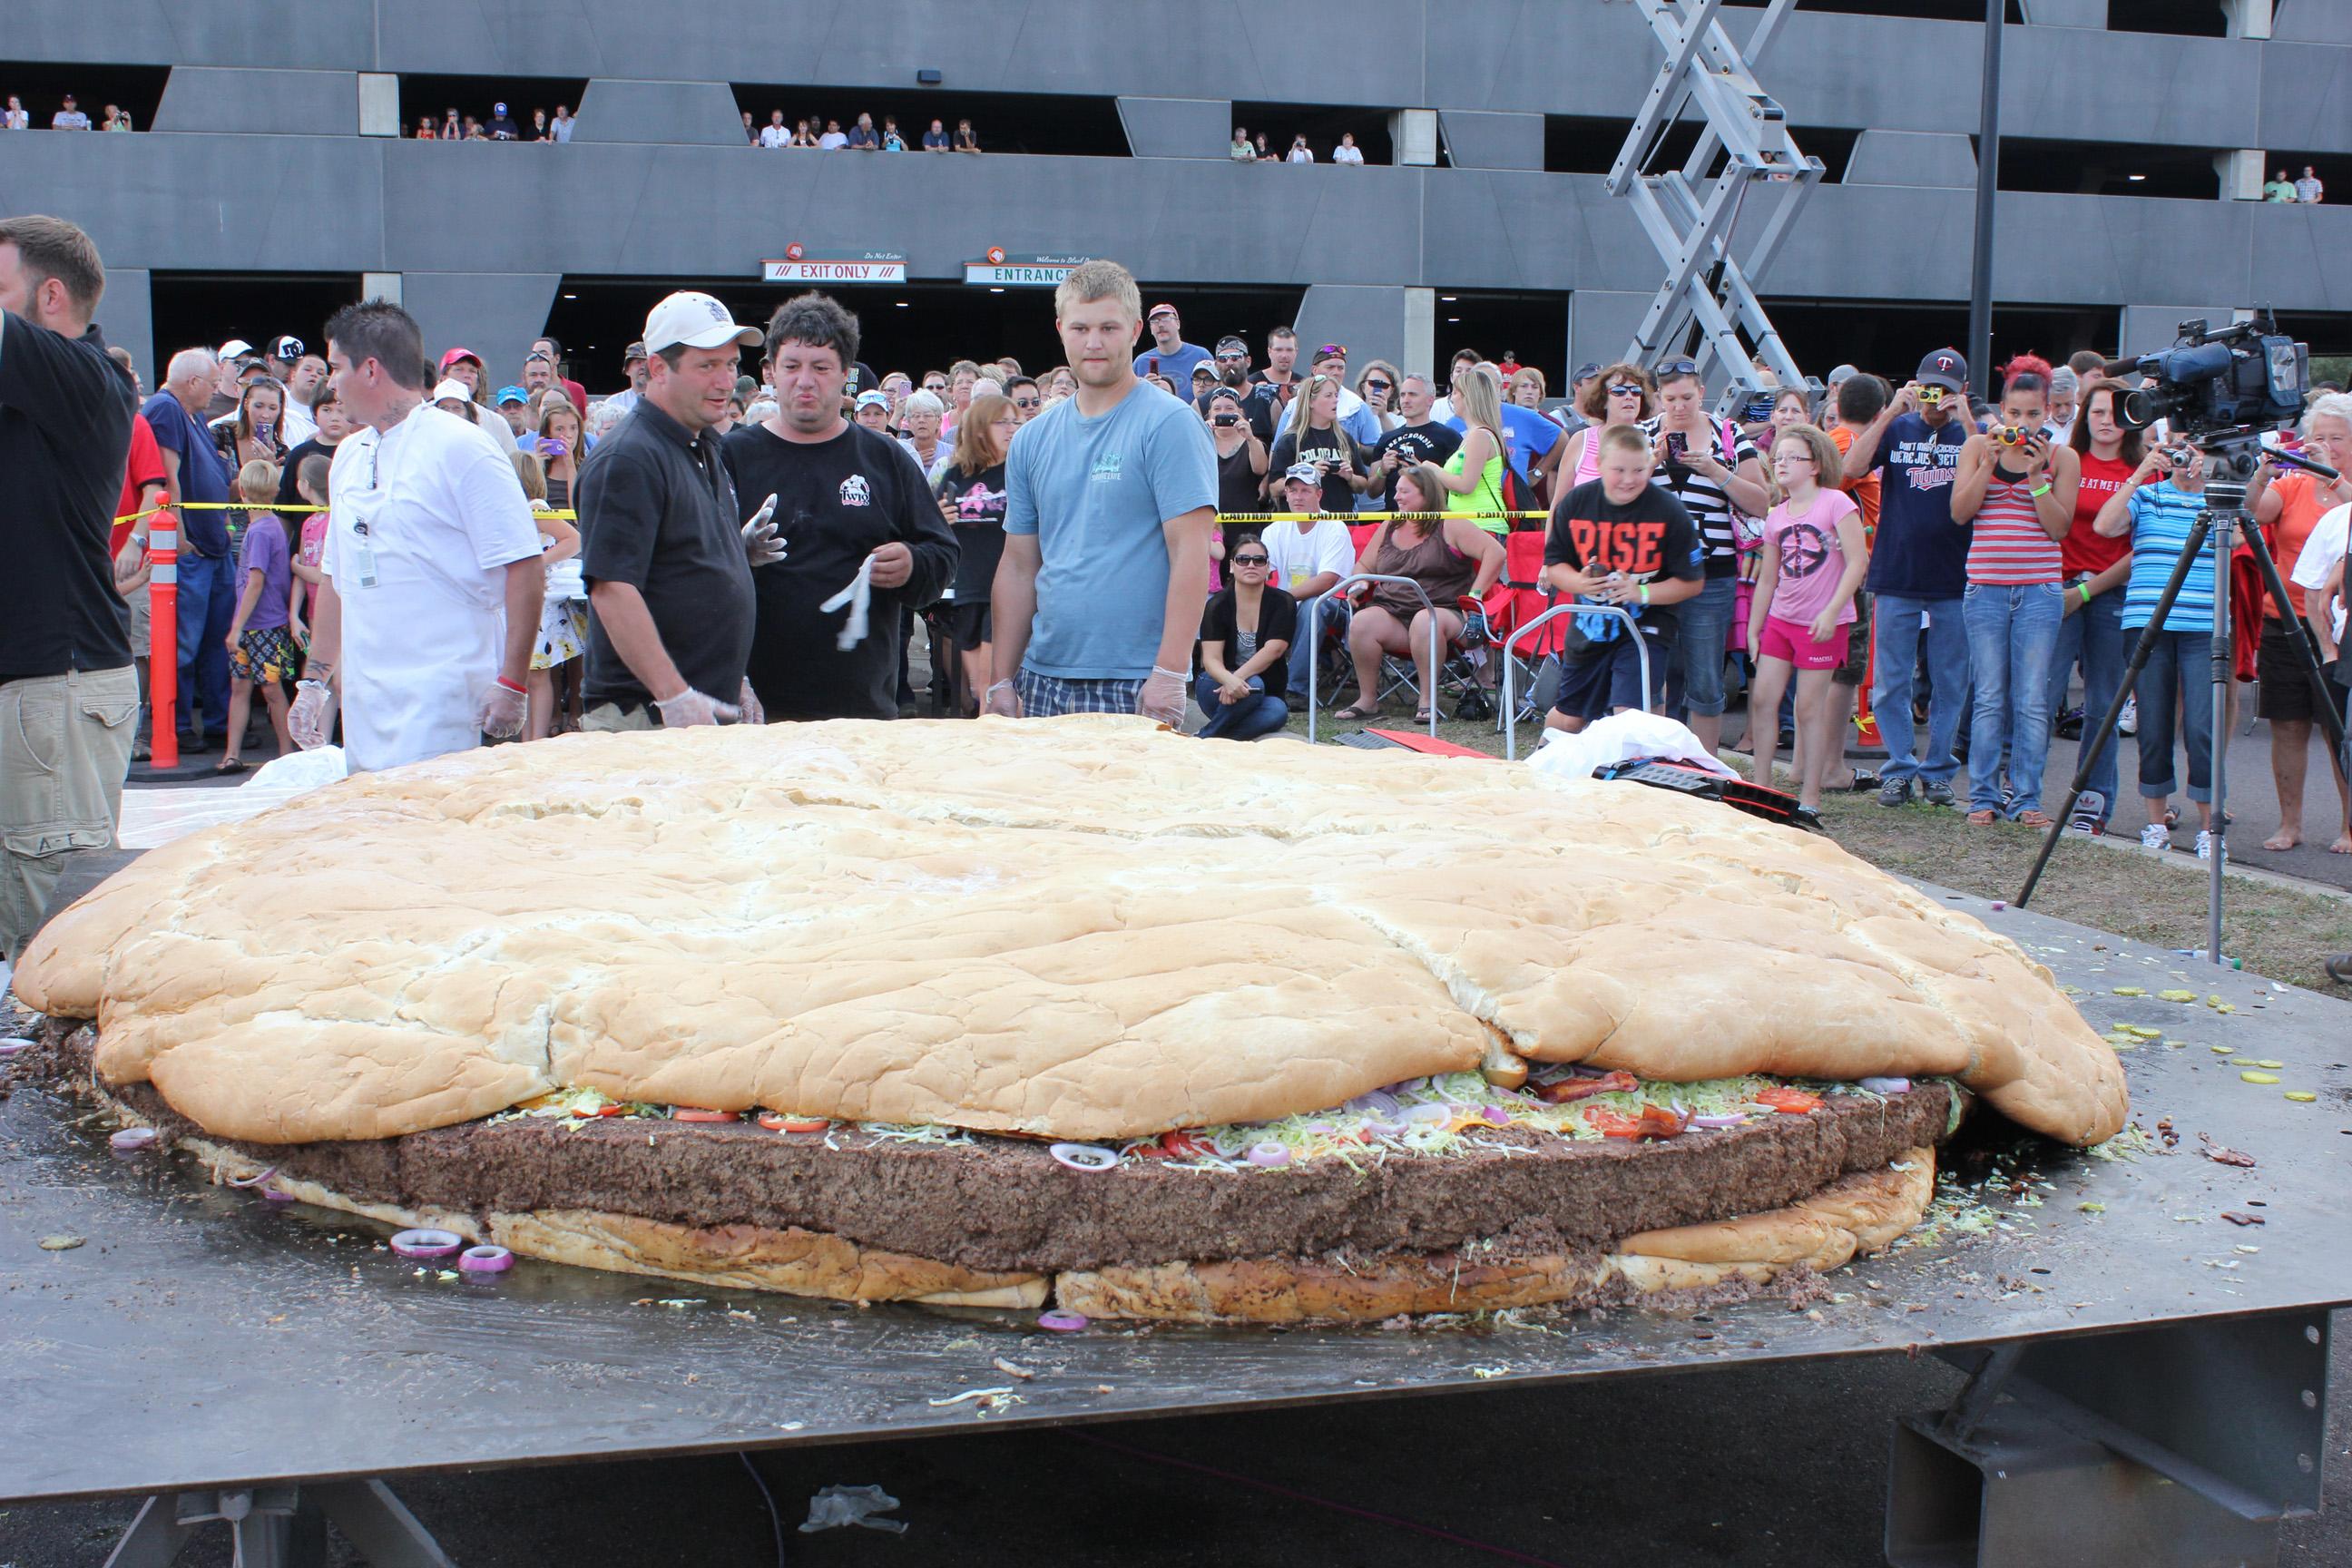 atme hamburger black bear casino resort cheeseburger bacon food - Biggest Cat In The World Guinness 2012